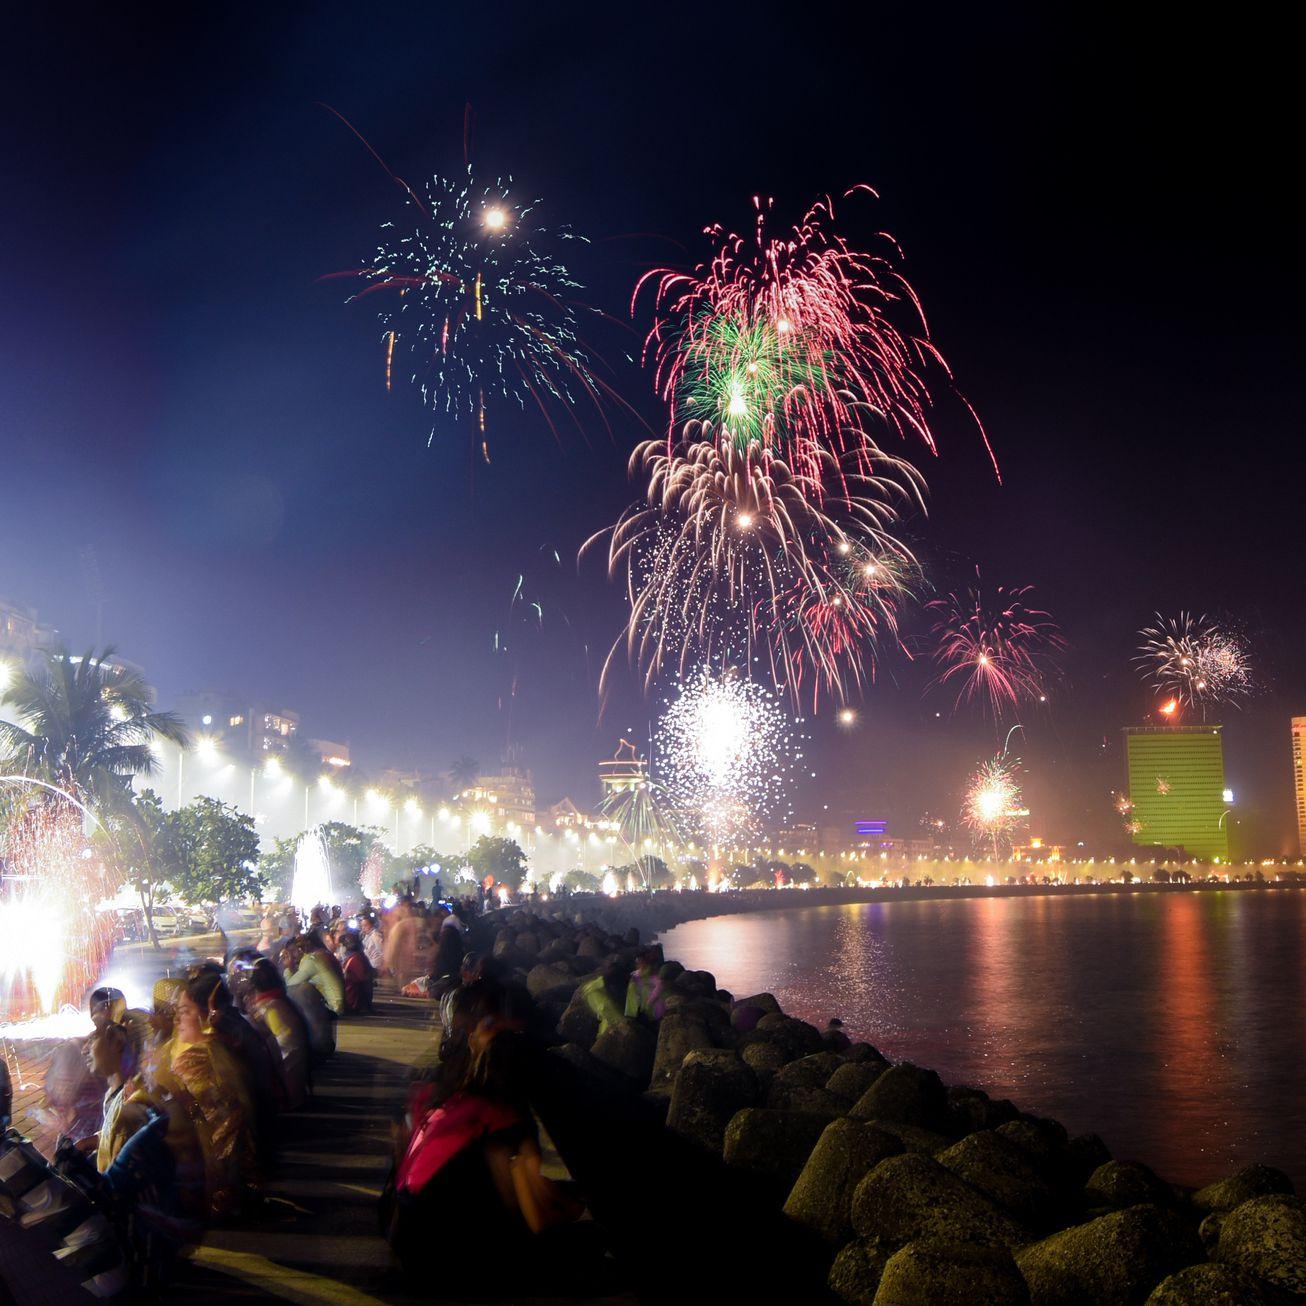 2020 diwali festival in india essential guide 2020 diwali festival in india